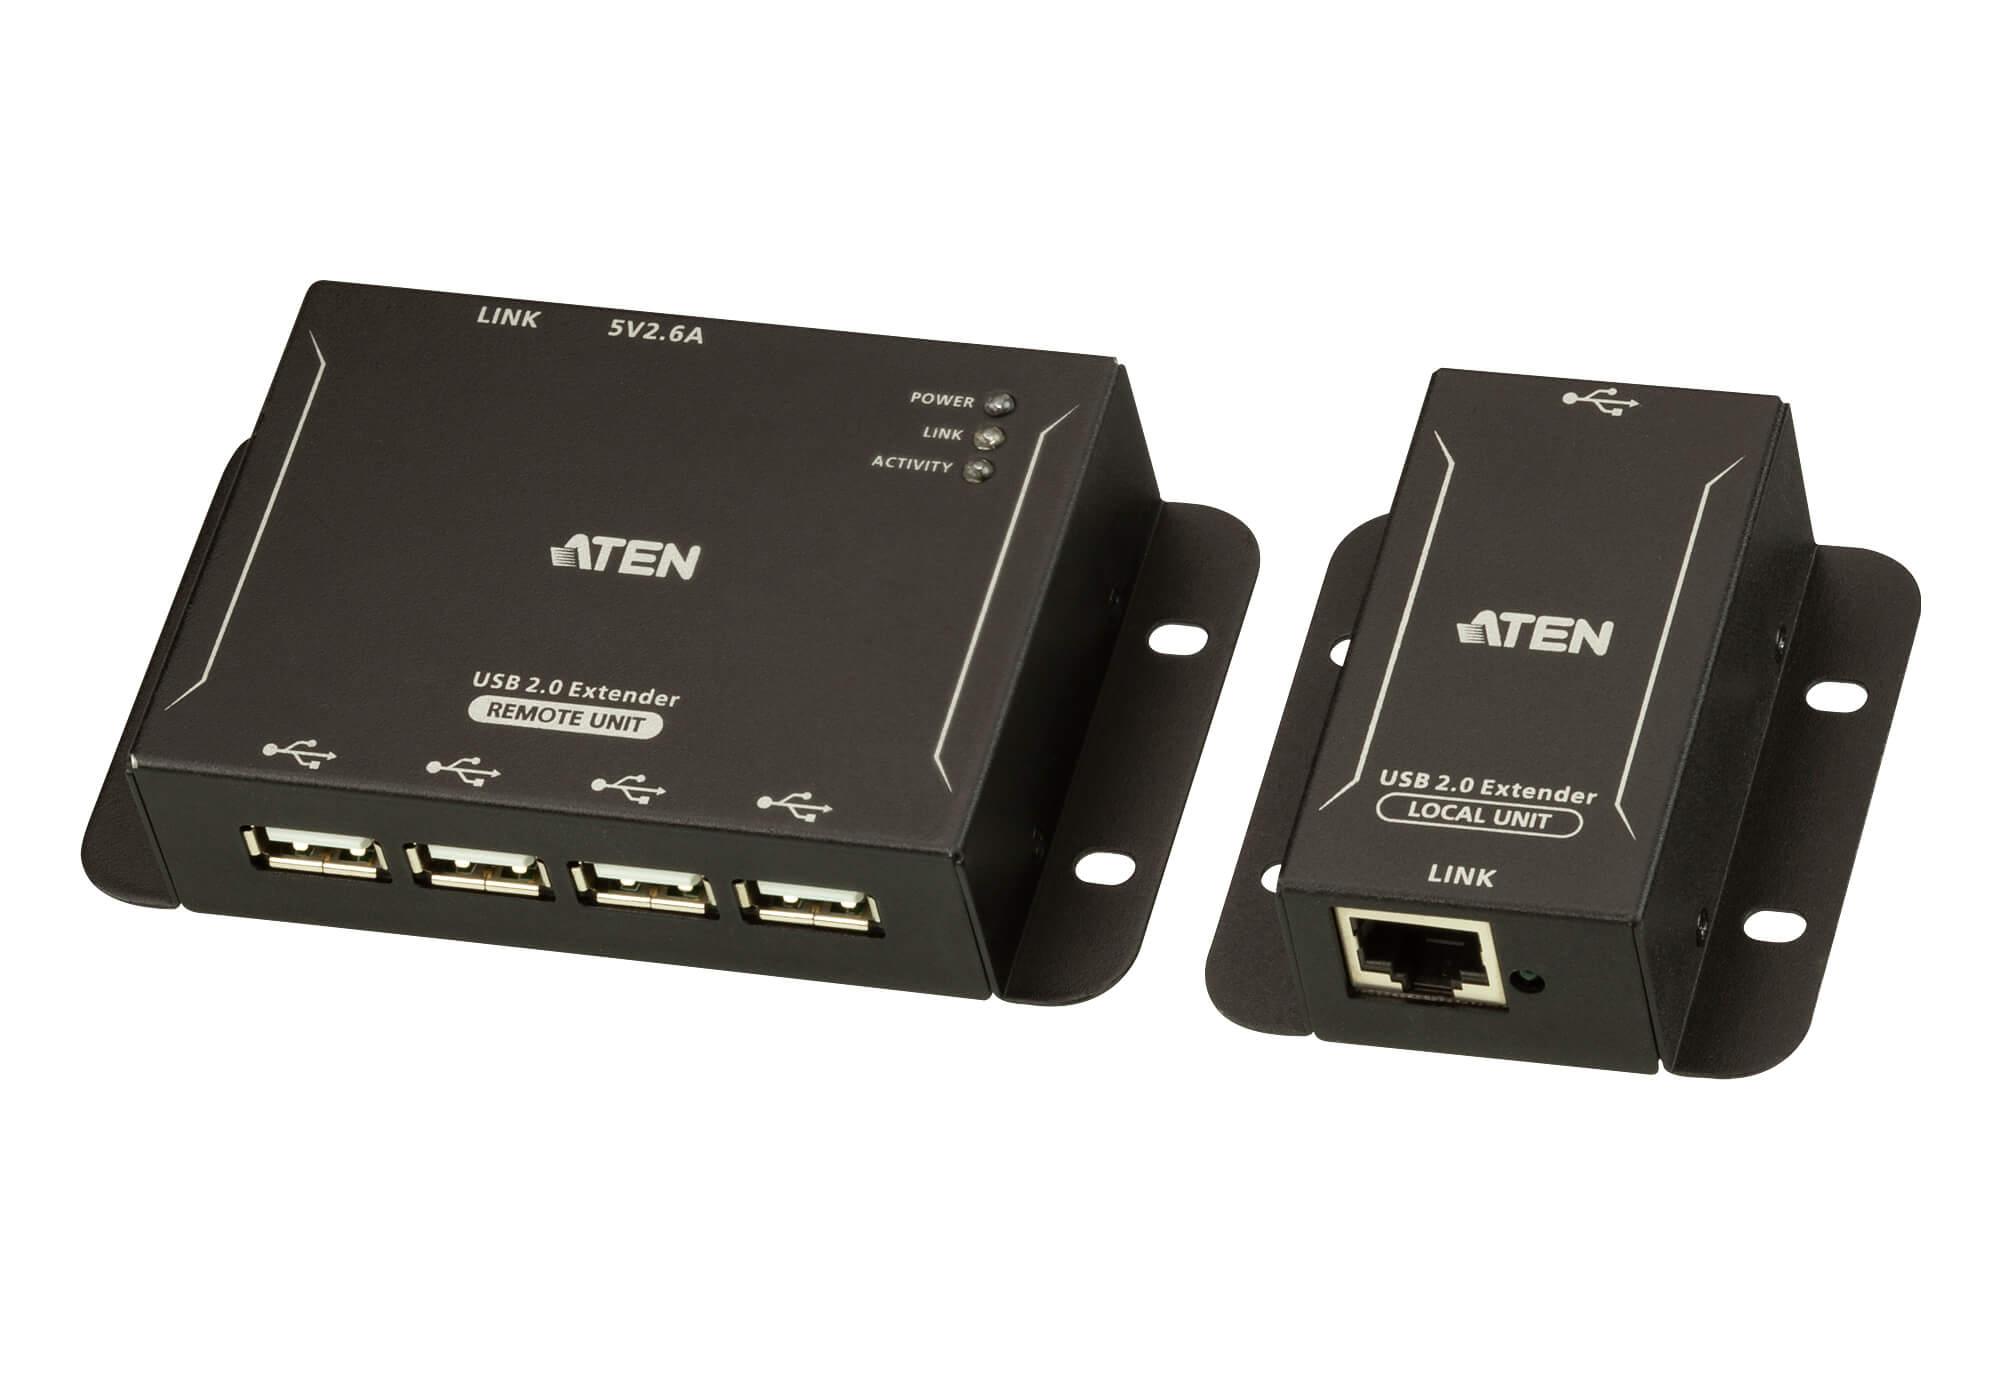 Aten 4-Port USB 2.0 CAT 5 Extender (Up to 50m)